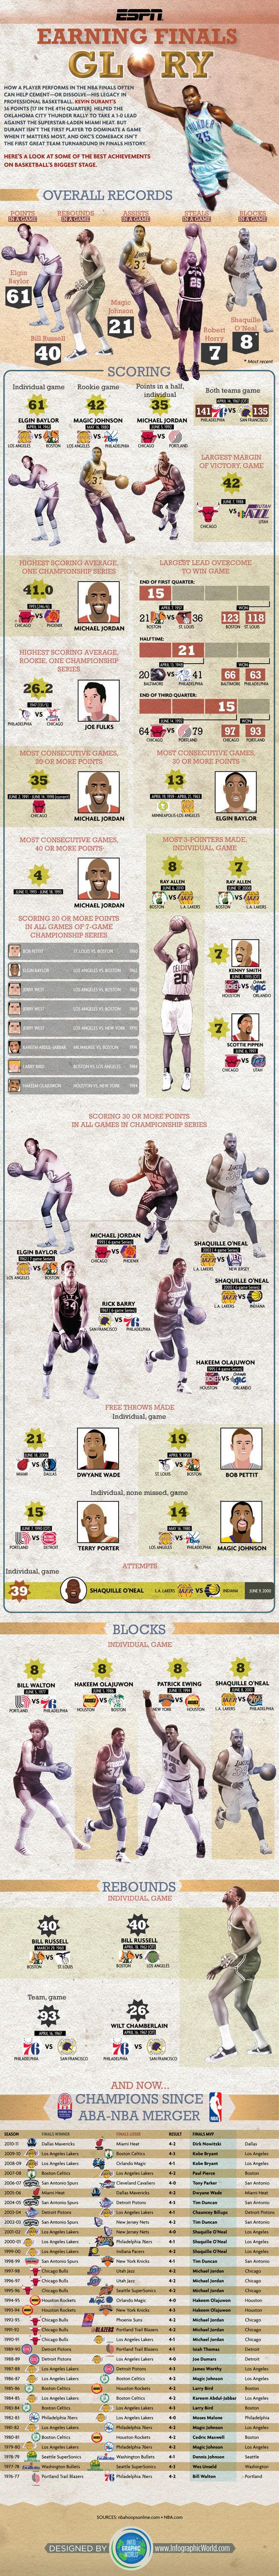 Nba-Finals-Glory-infographic